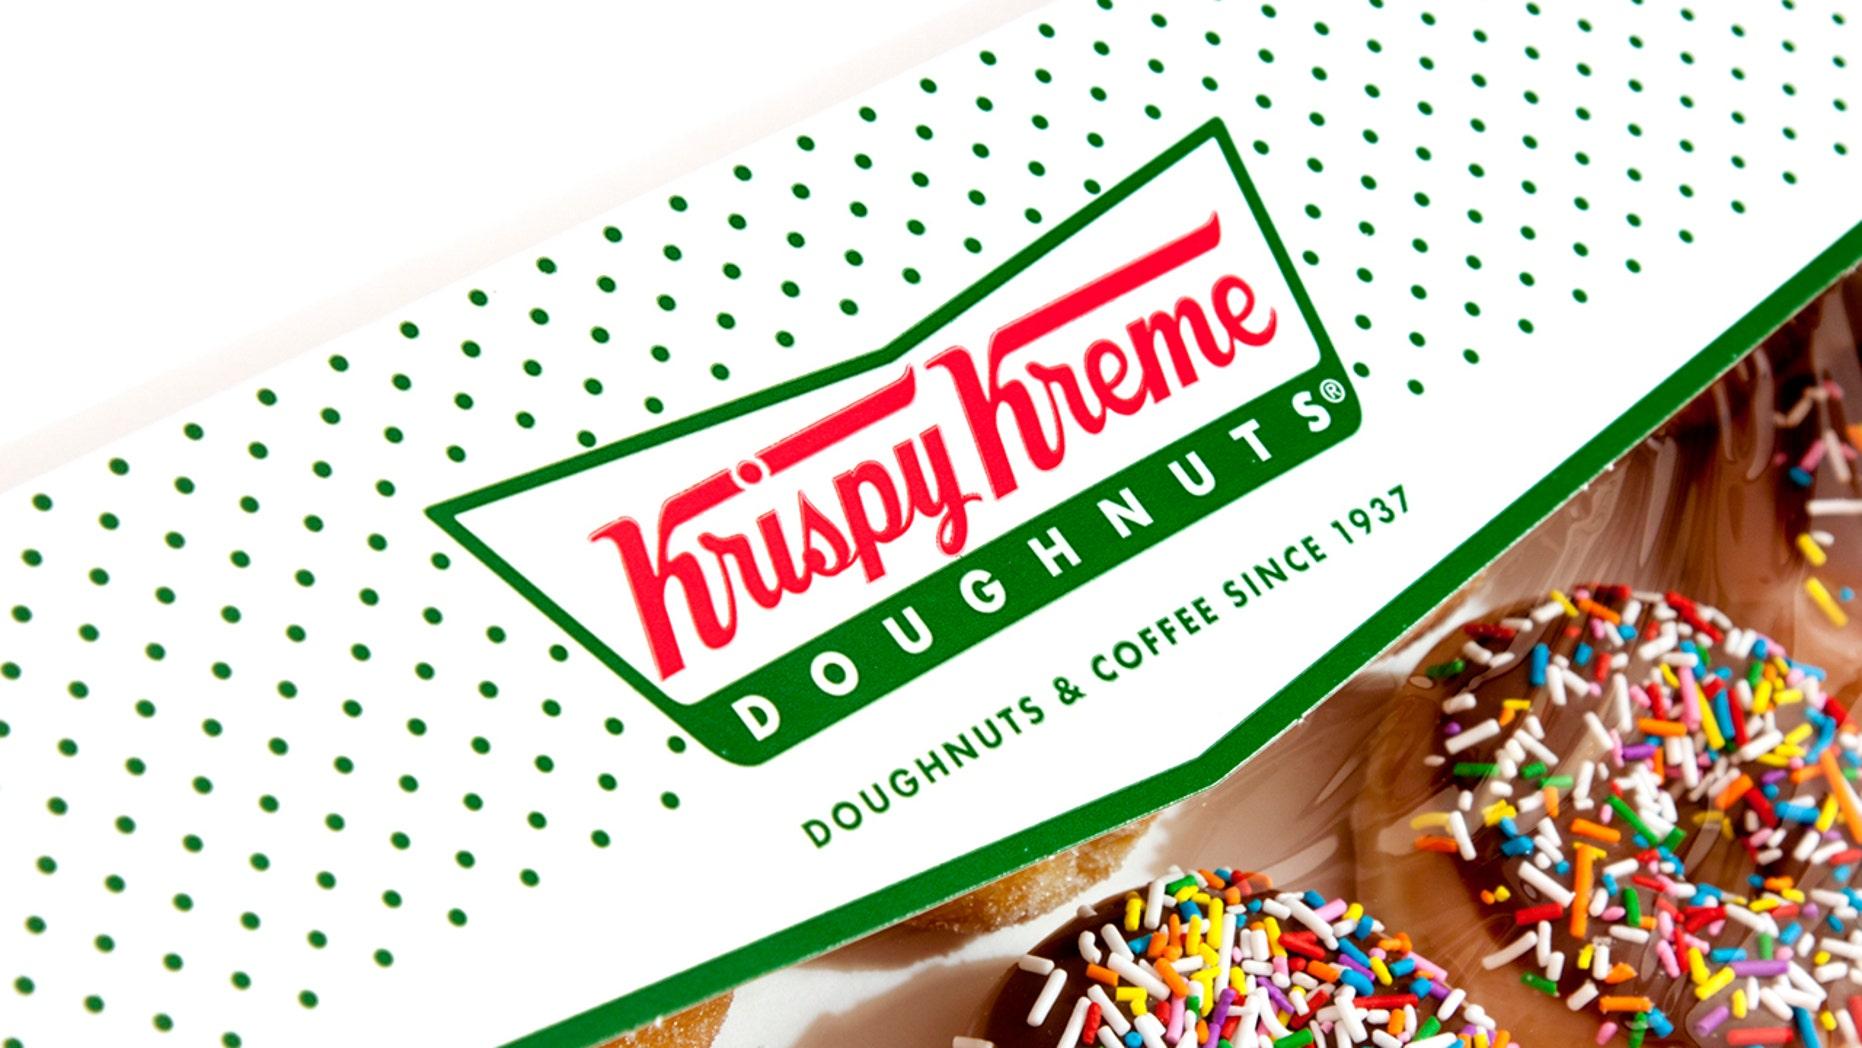 Coronavirus consequence : Krispy Kreme forced to change 'graduate dozen' promotion due to traffic jam, lack of doughnuts